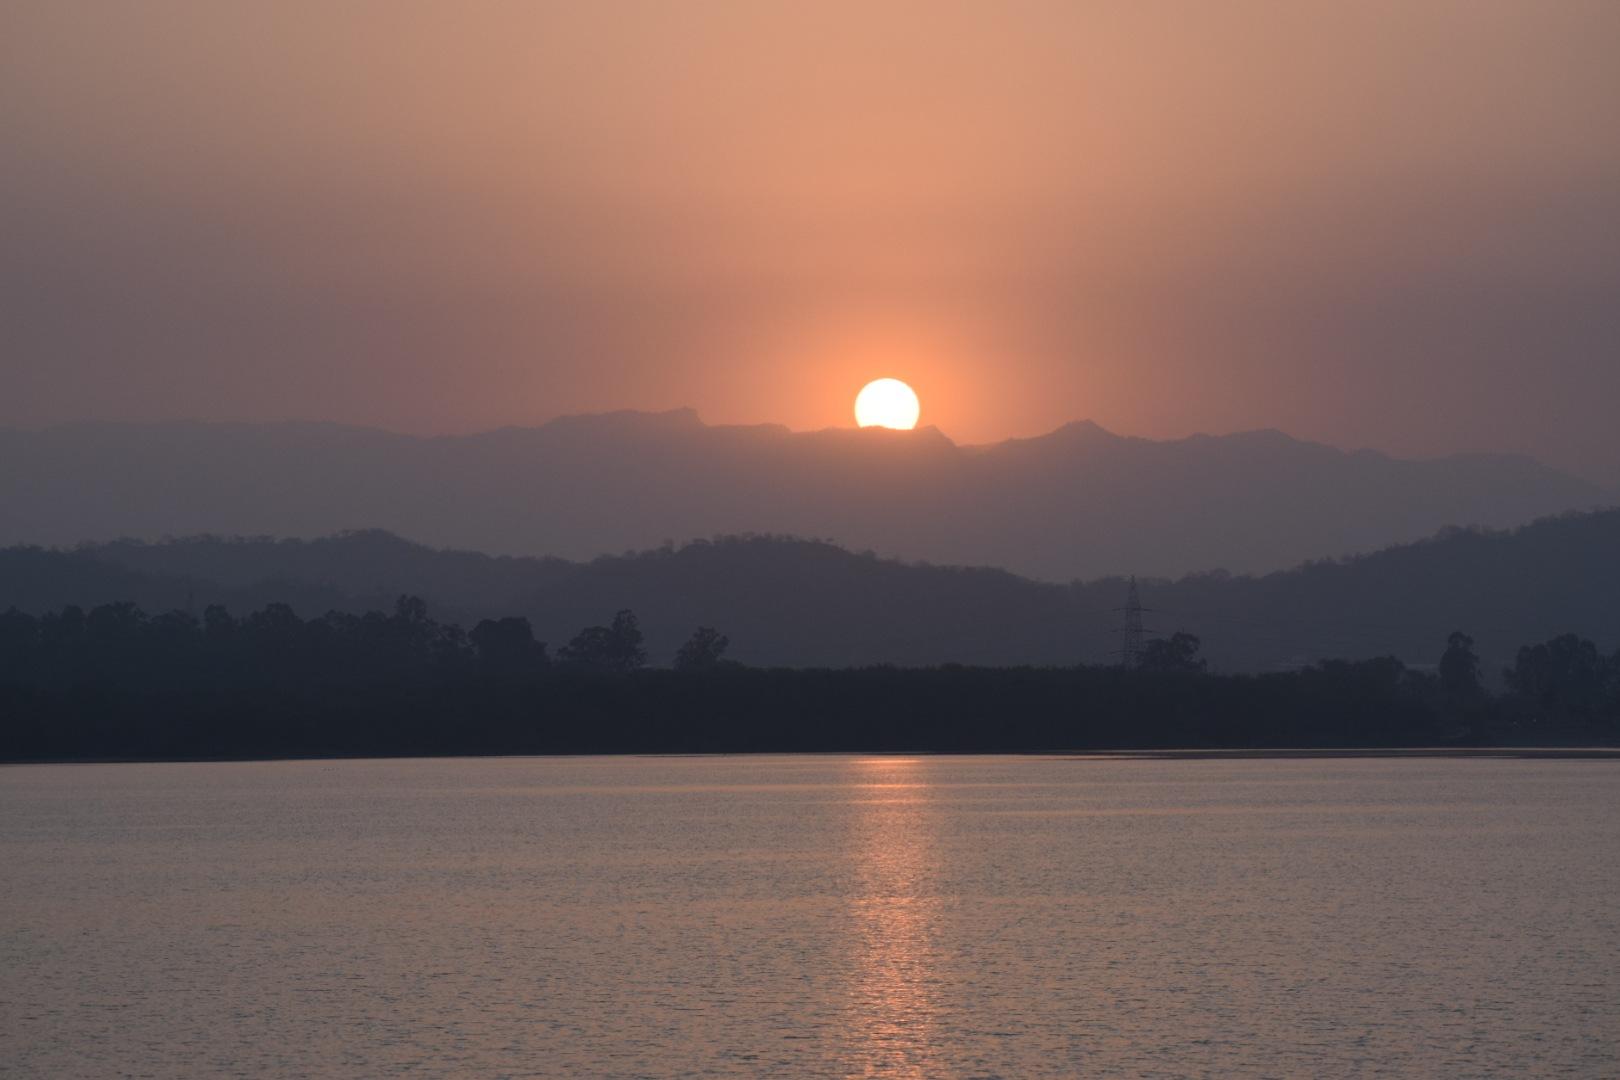 Great Shade of Sunrise by Jasman Sahni (Jazzyturbanator)